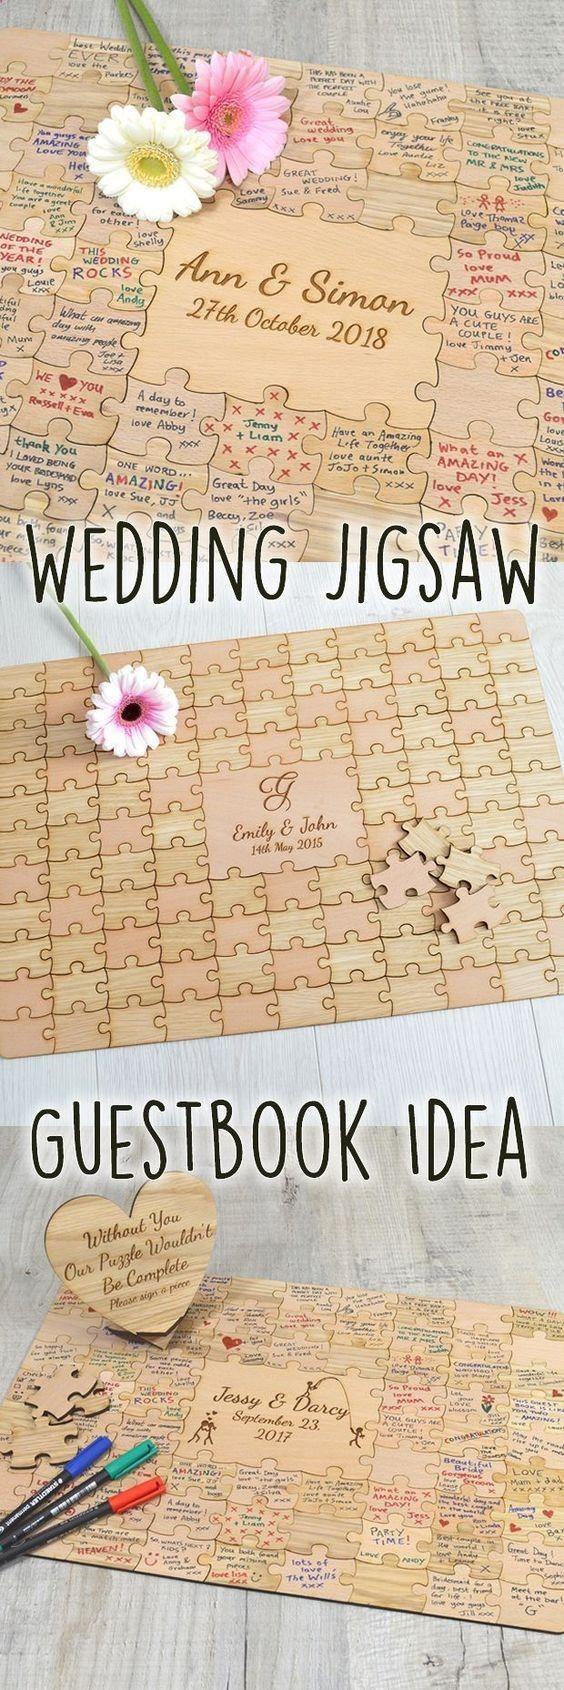 Wedding decorations white november 2018  New and Unique Wedding Ideas with More november wedding ideas